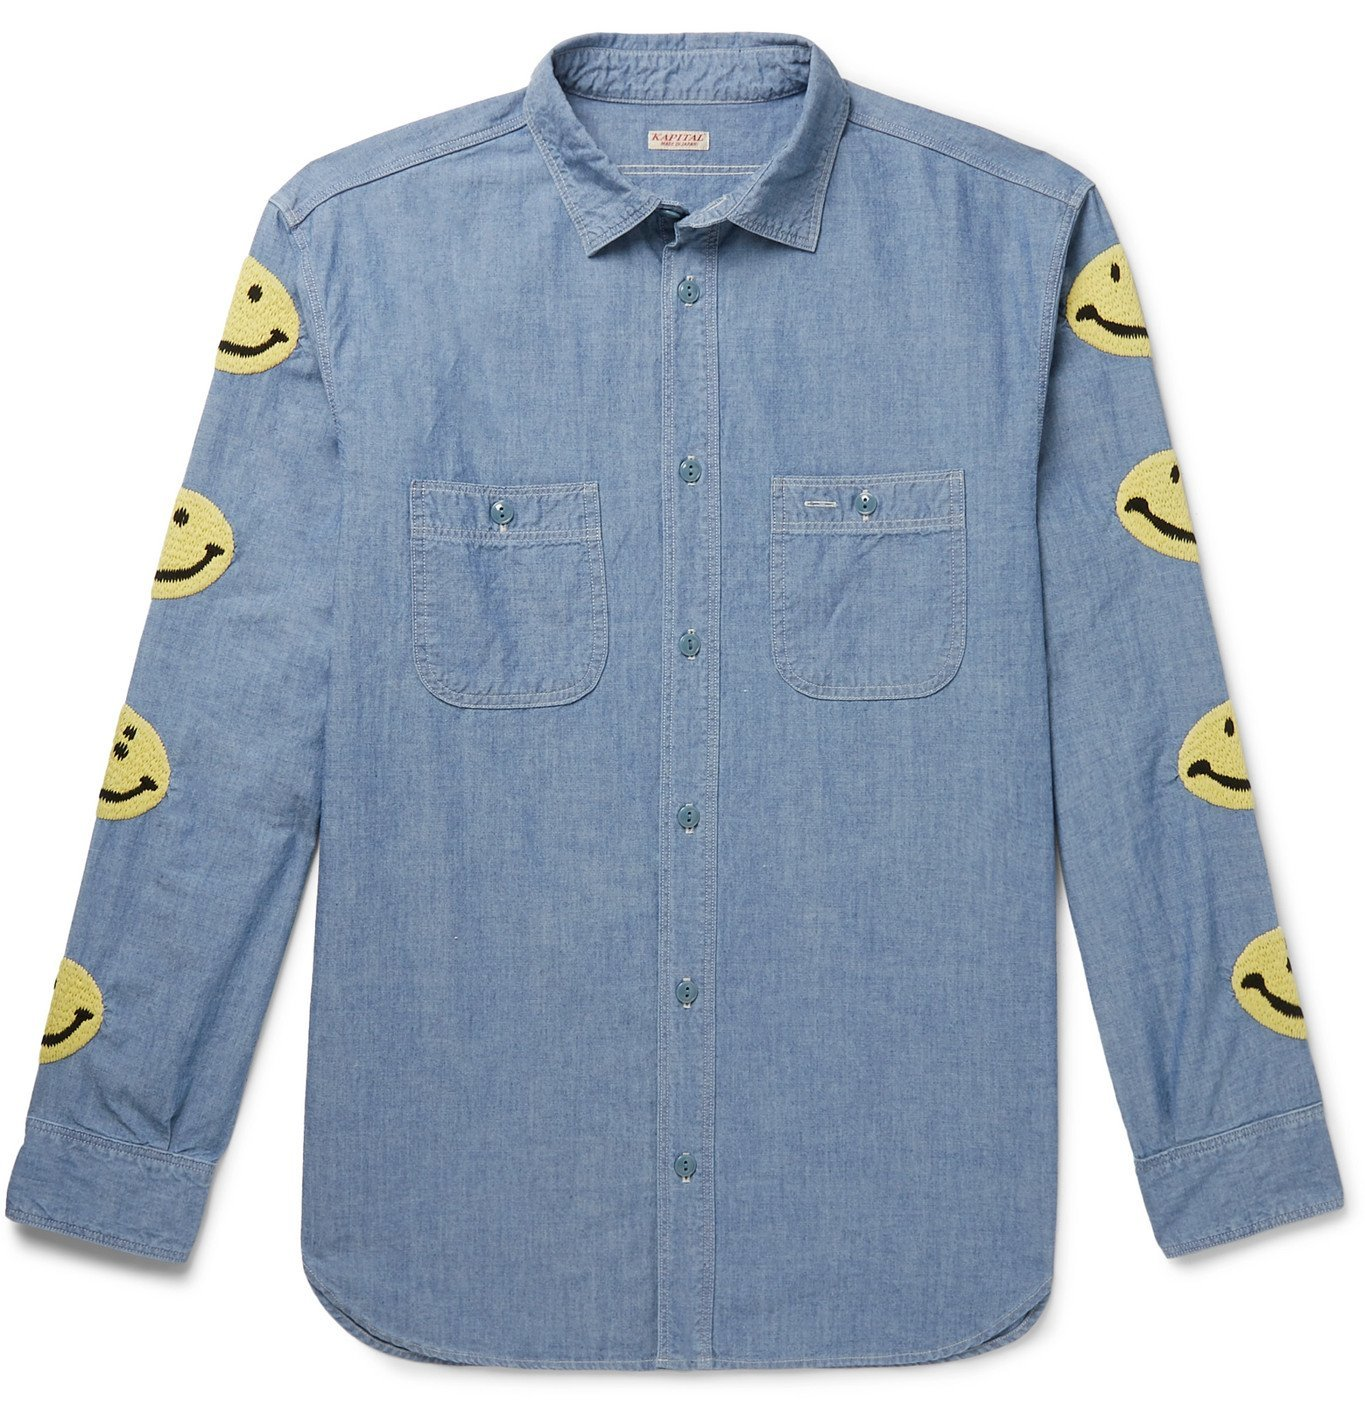 KAPITAL - Embroidered Cotton-Chambray Shirt - Black